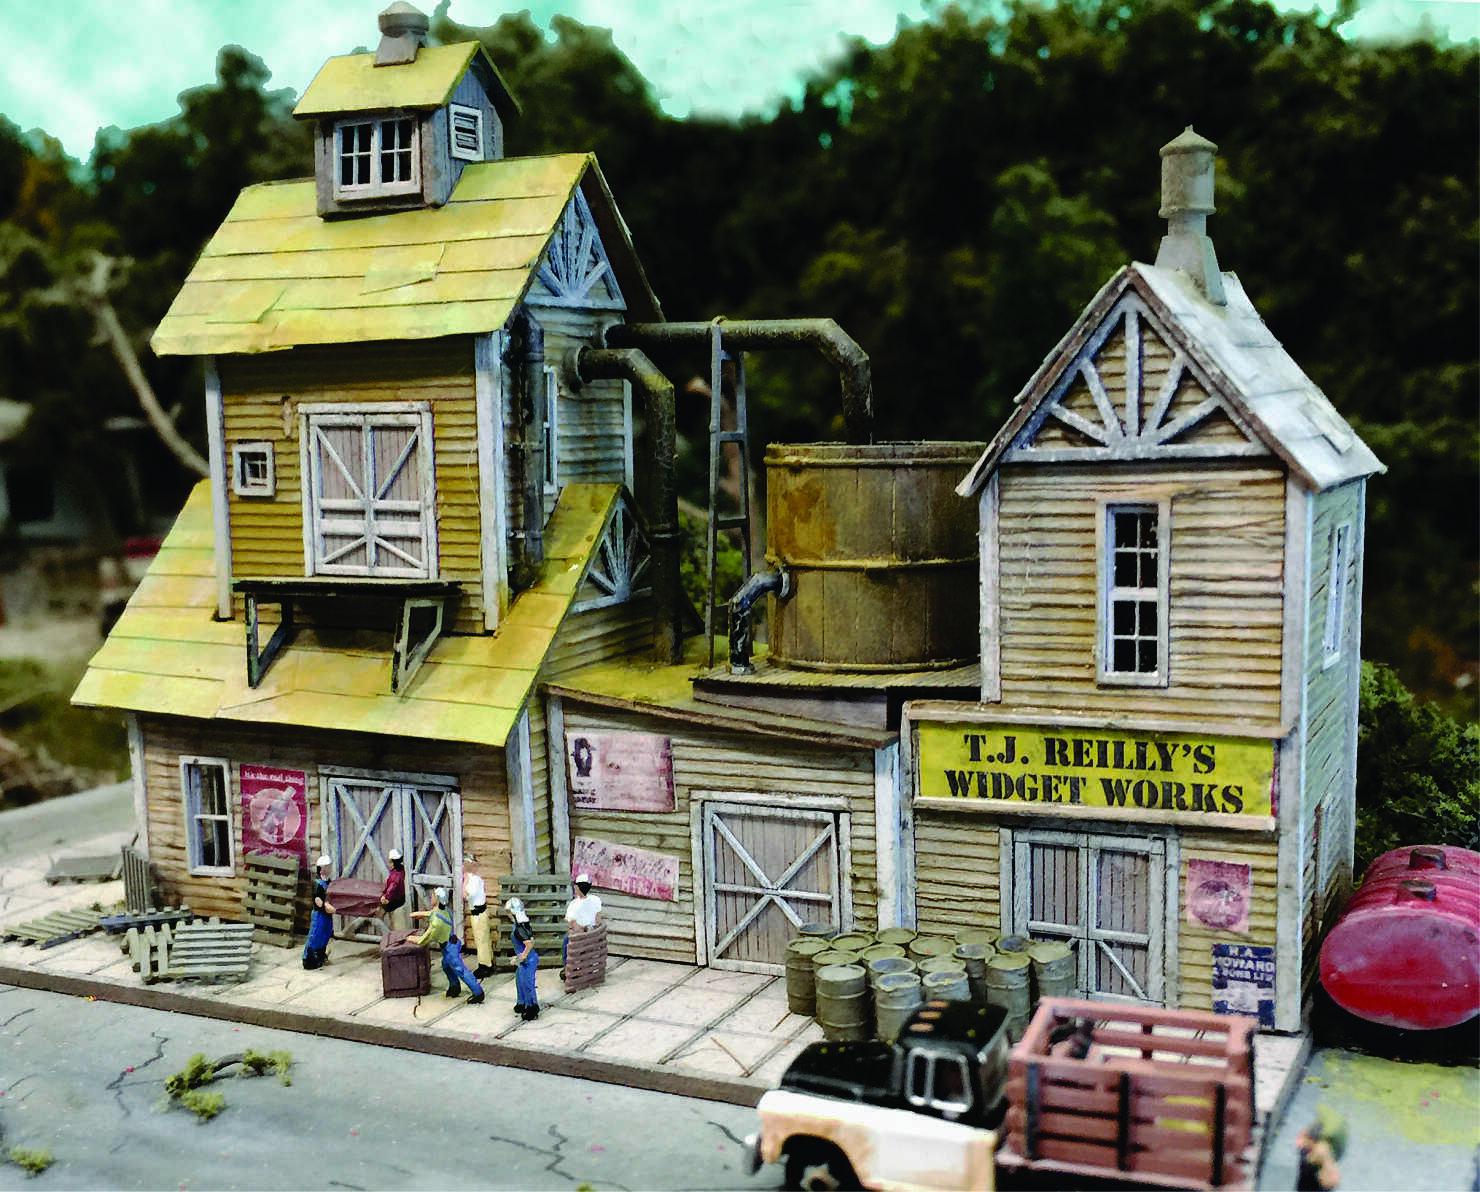 BAR MILLS 161 N Scale TJ Reilly Widget Works Building Railroad Kit FREE SHIP